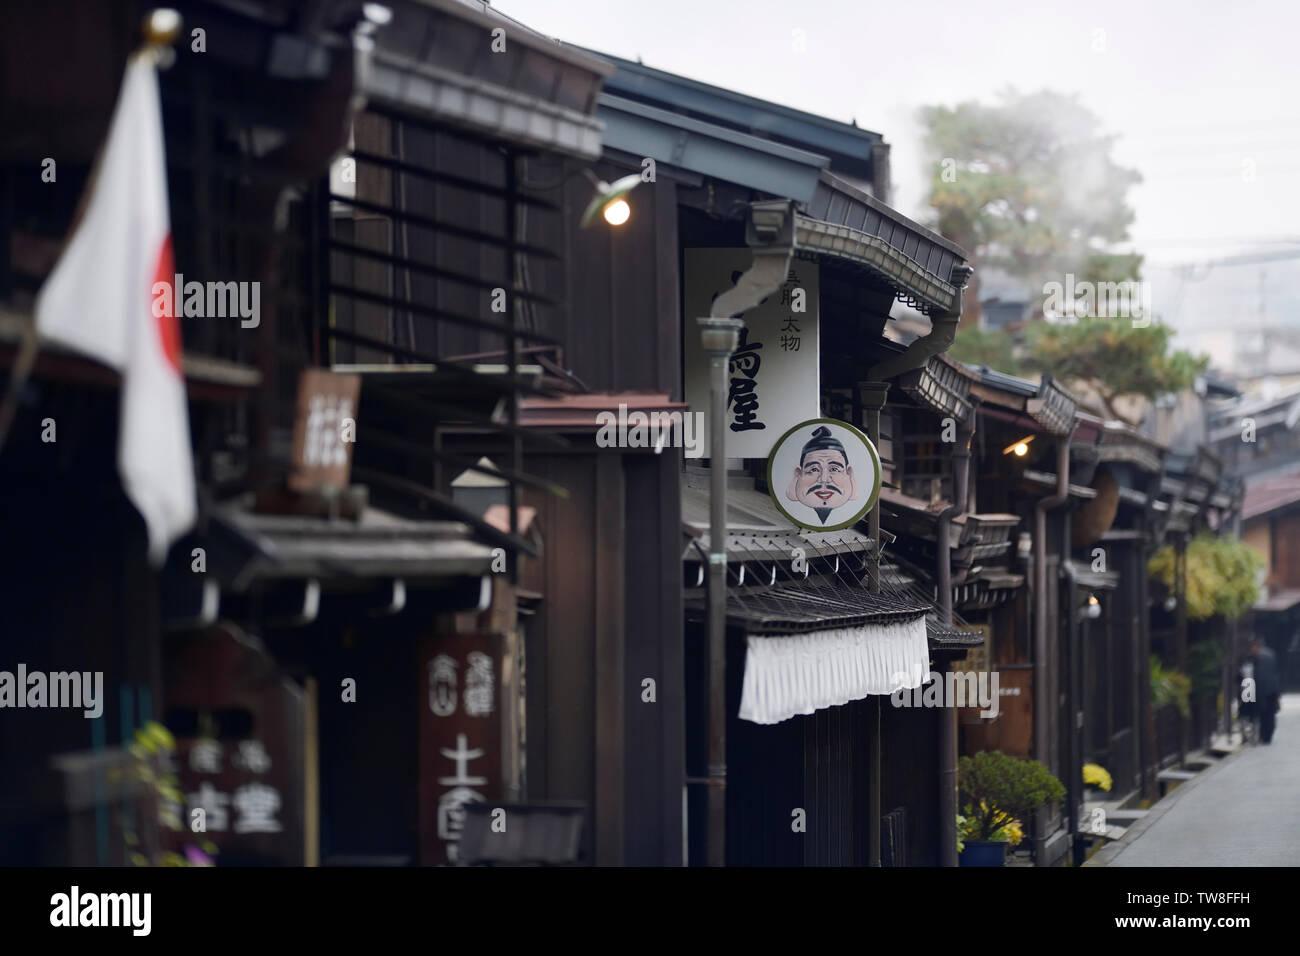 Kamisannomachi, old town merchant street with signs of shops and restaurants in Takayama city. Odoriya Kimono store sign. Japan - Stock Image